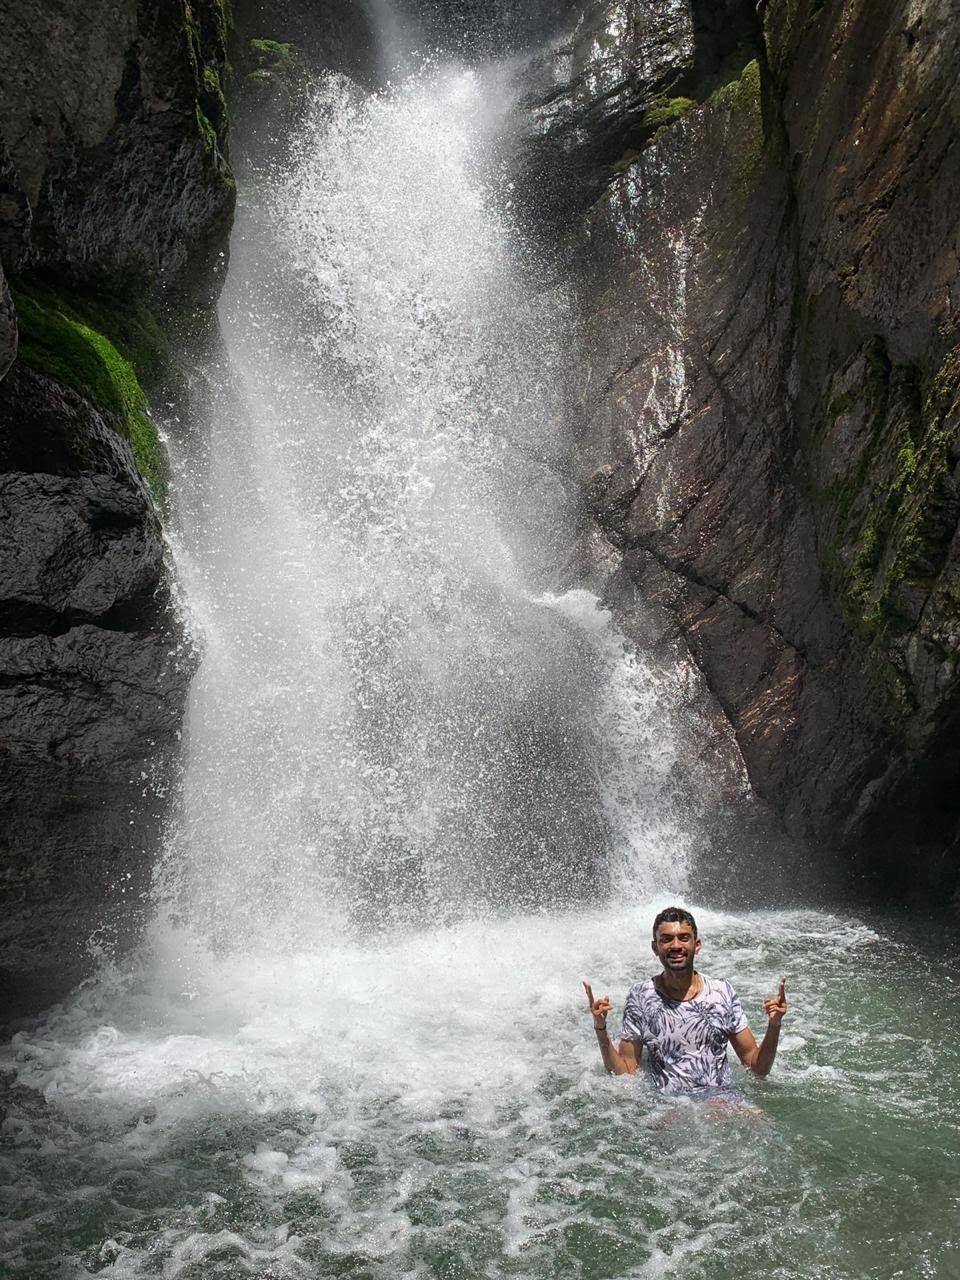 Hidden Waterfall in Bir Billing, Himachal Pradesh